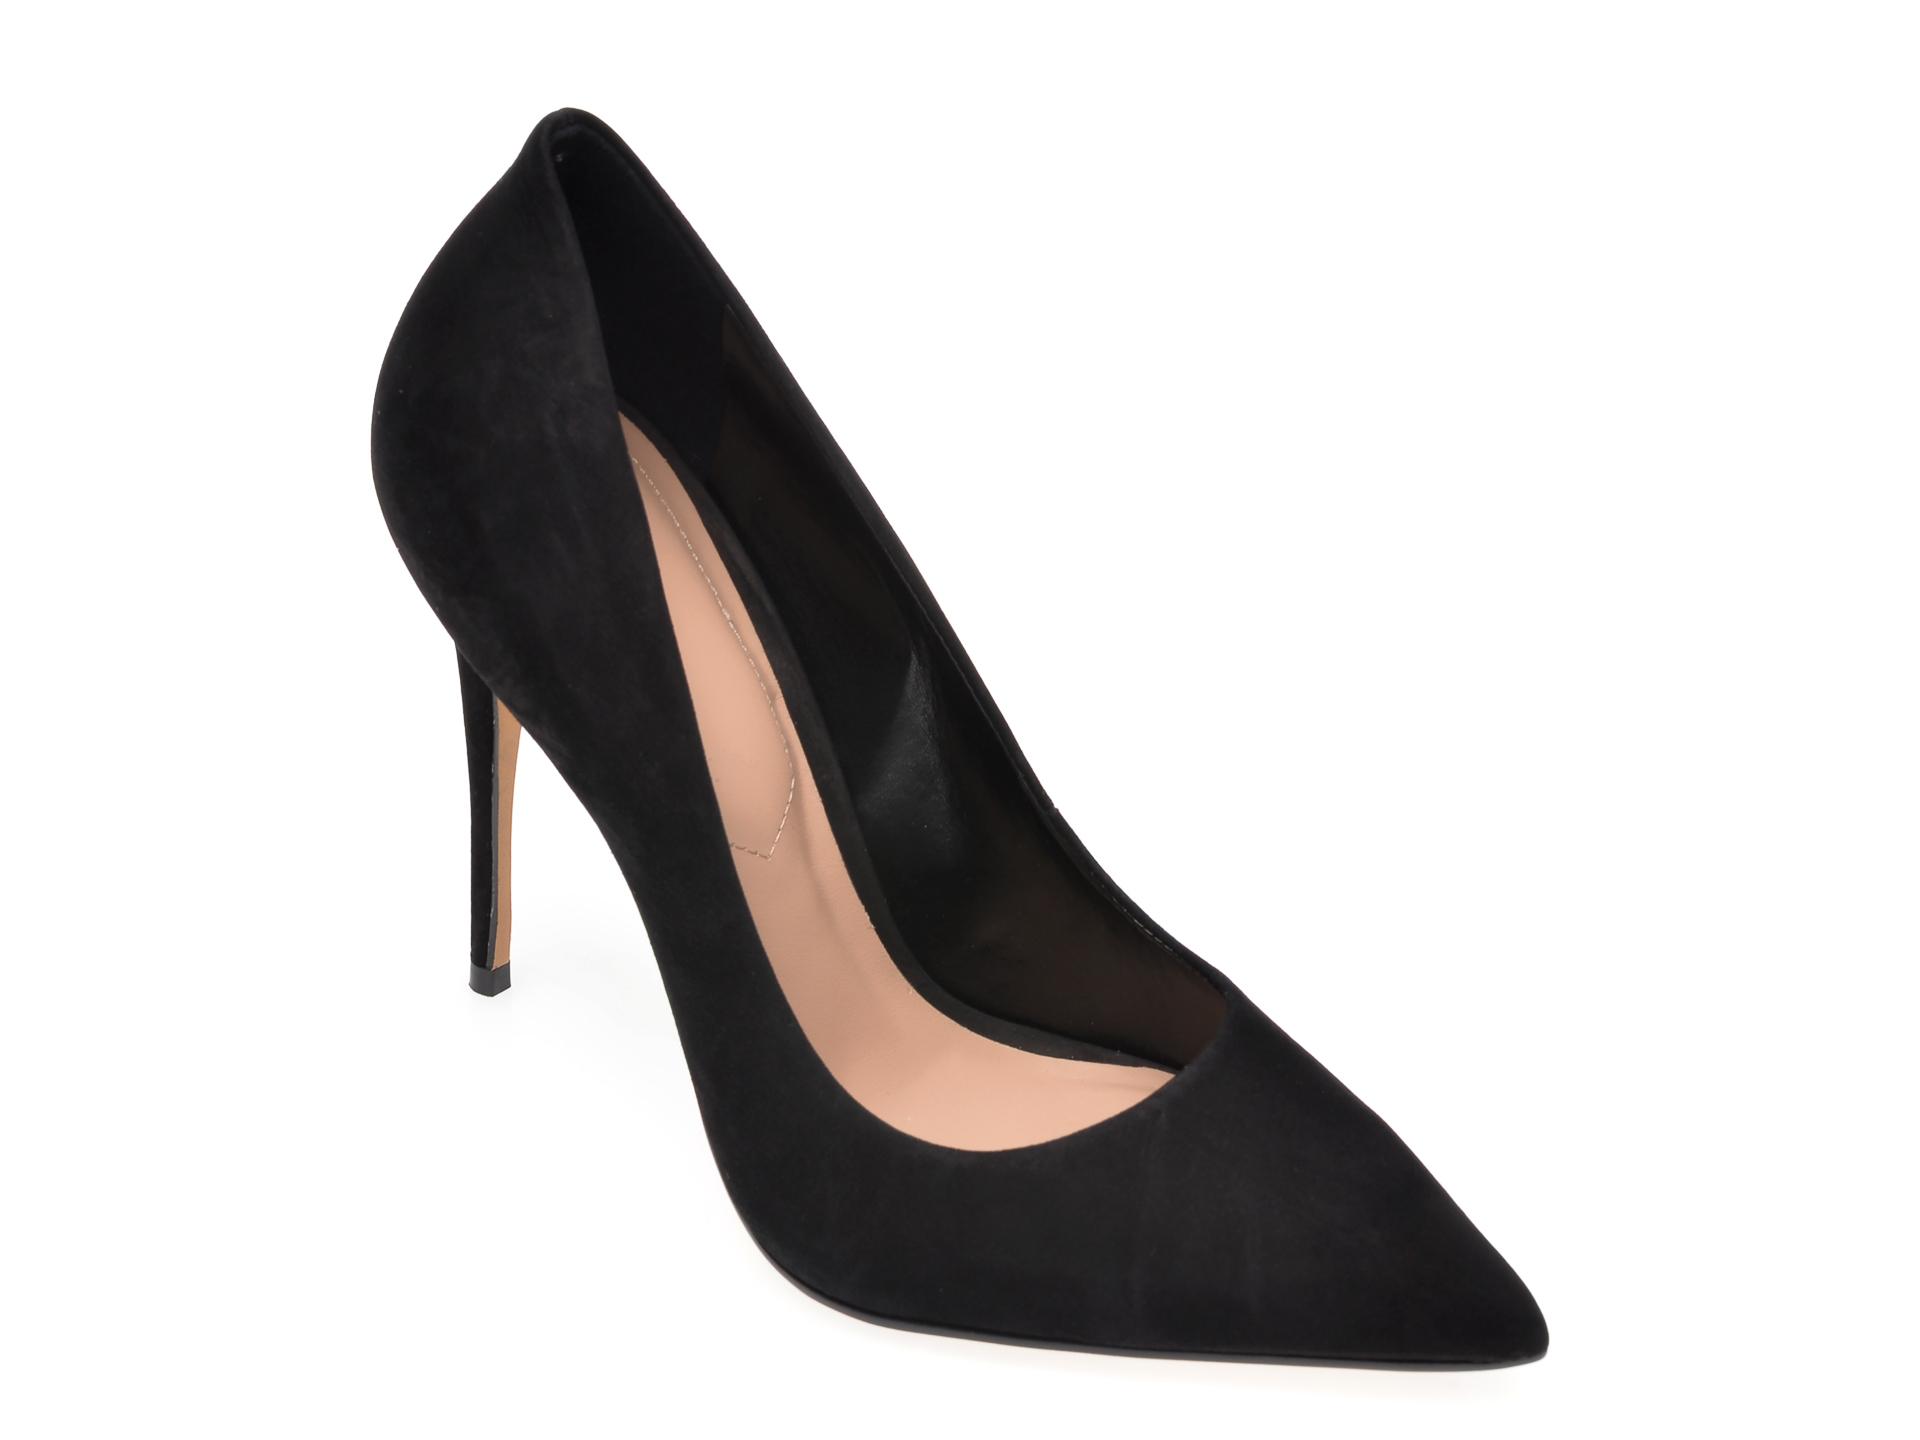 Pantofi ALDO negri, Cassedy001, din nabuc imagine